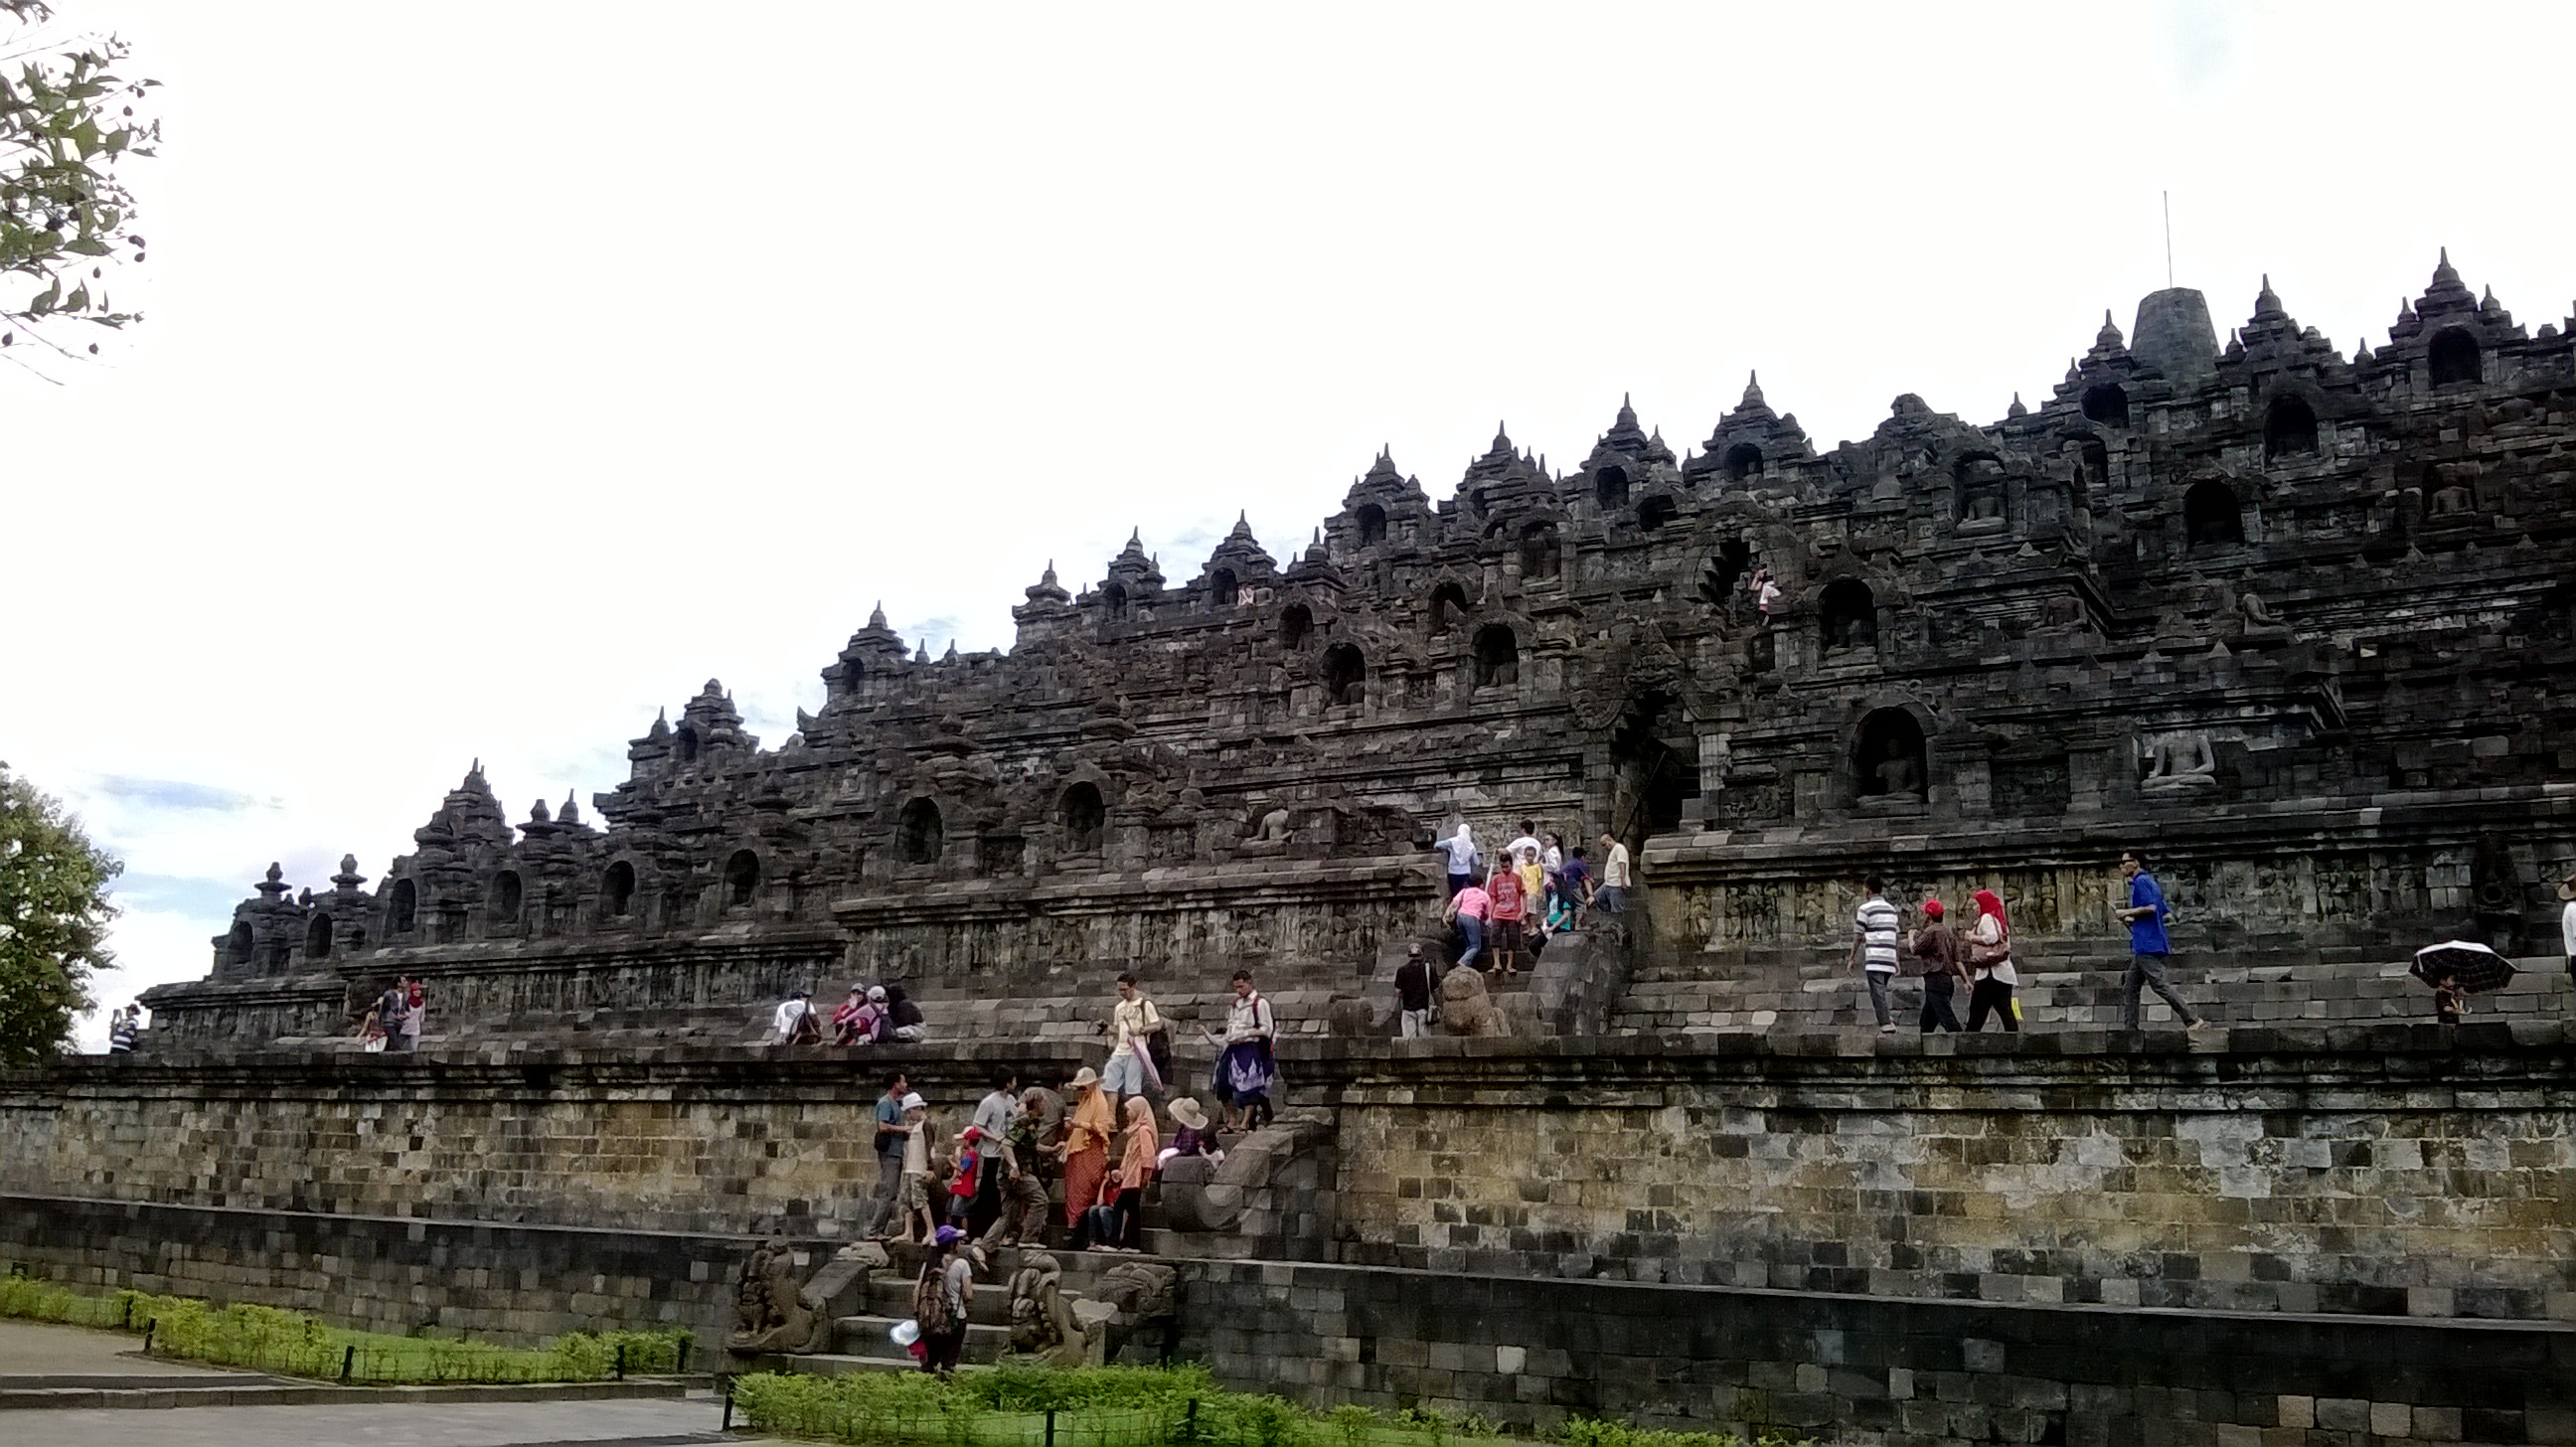 Ayo Dolan Candi 1 Lumbung Asu Pendem Borobudur Magelang Bukan